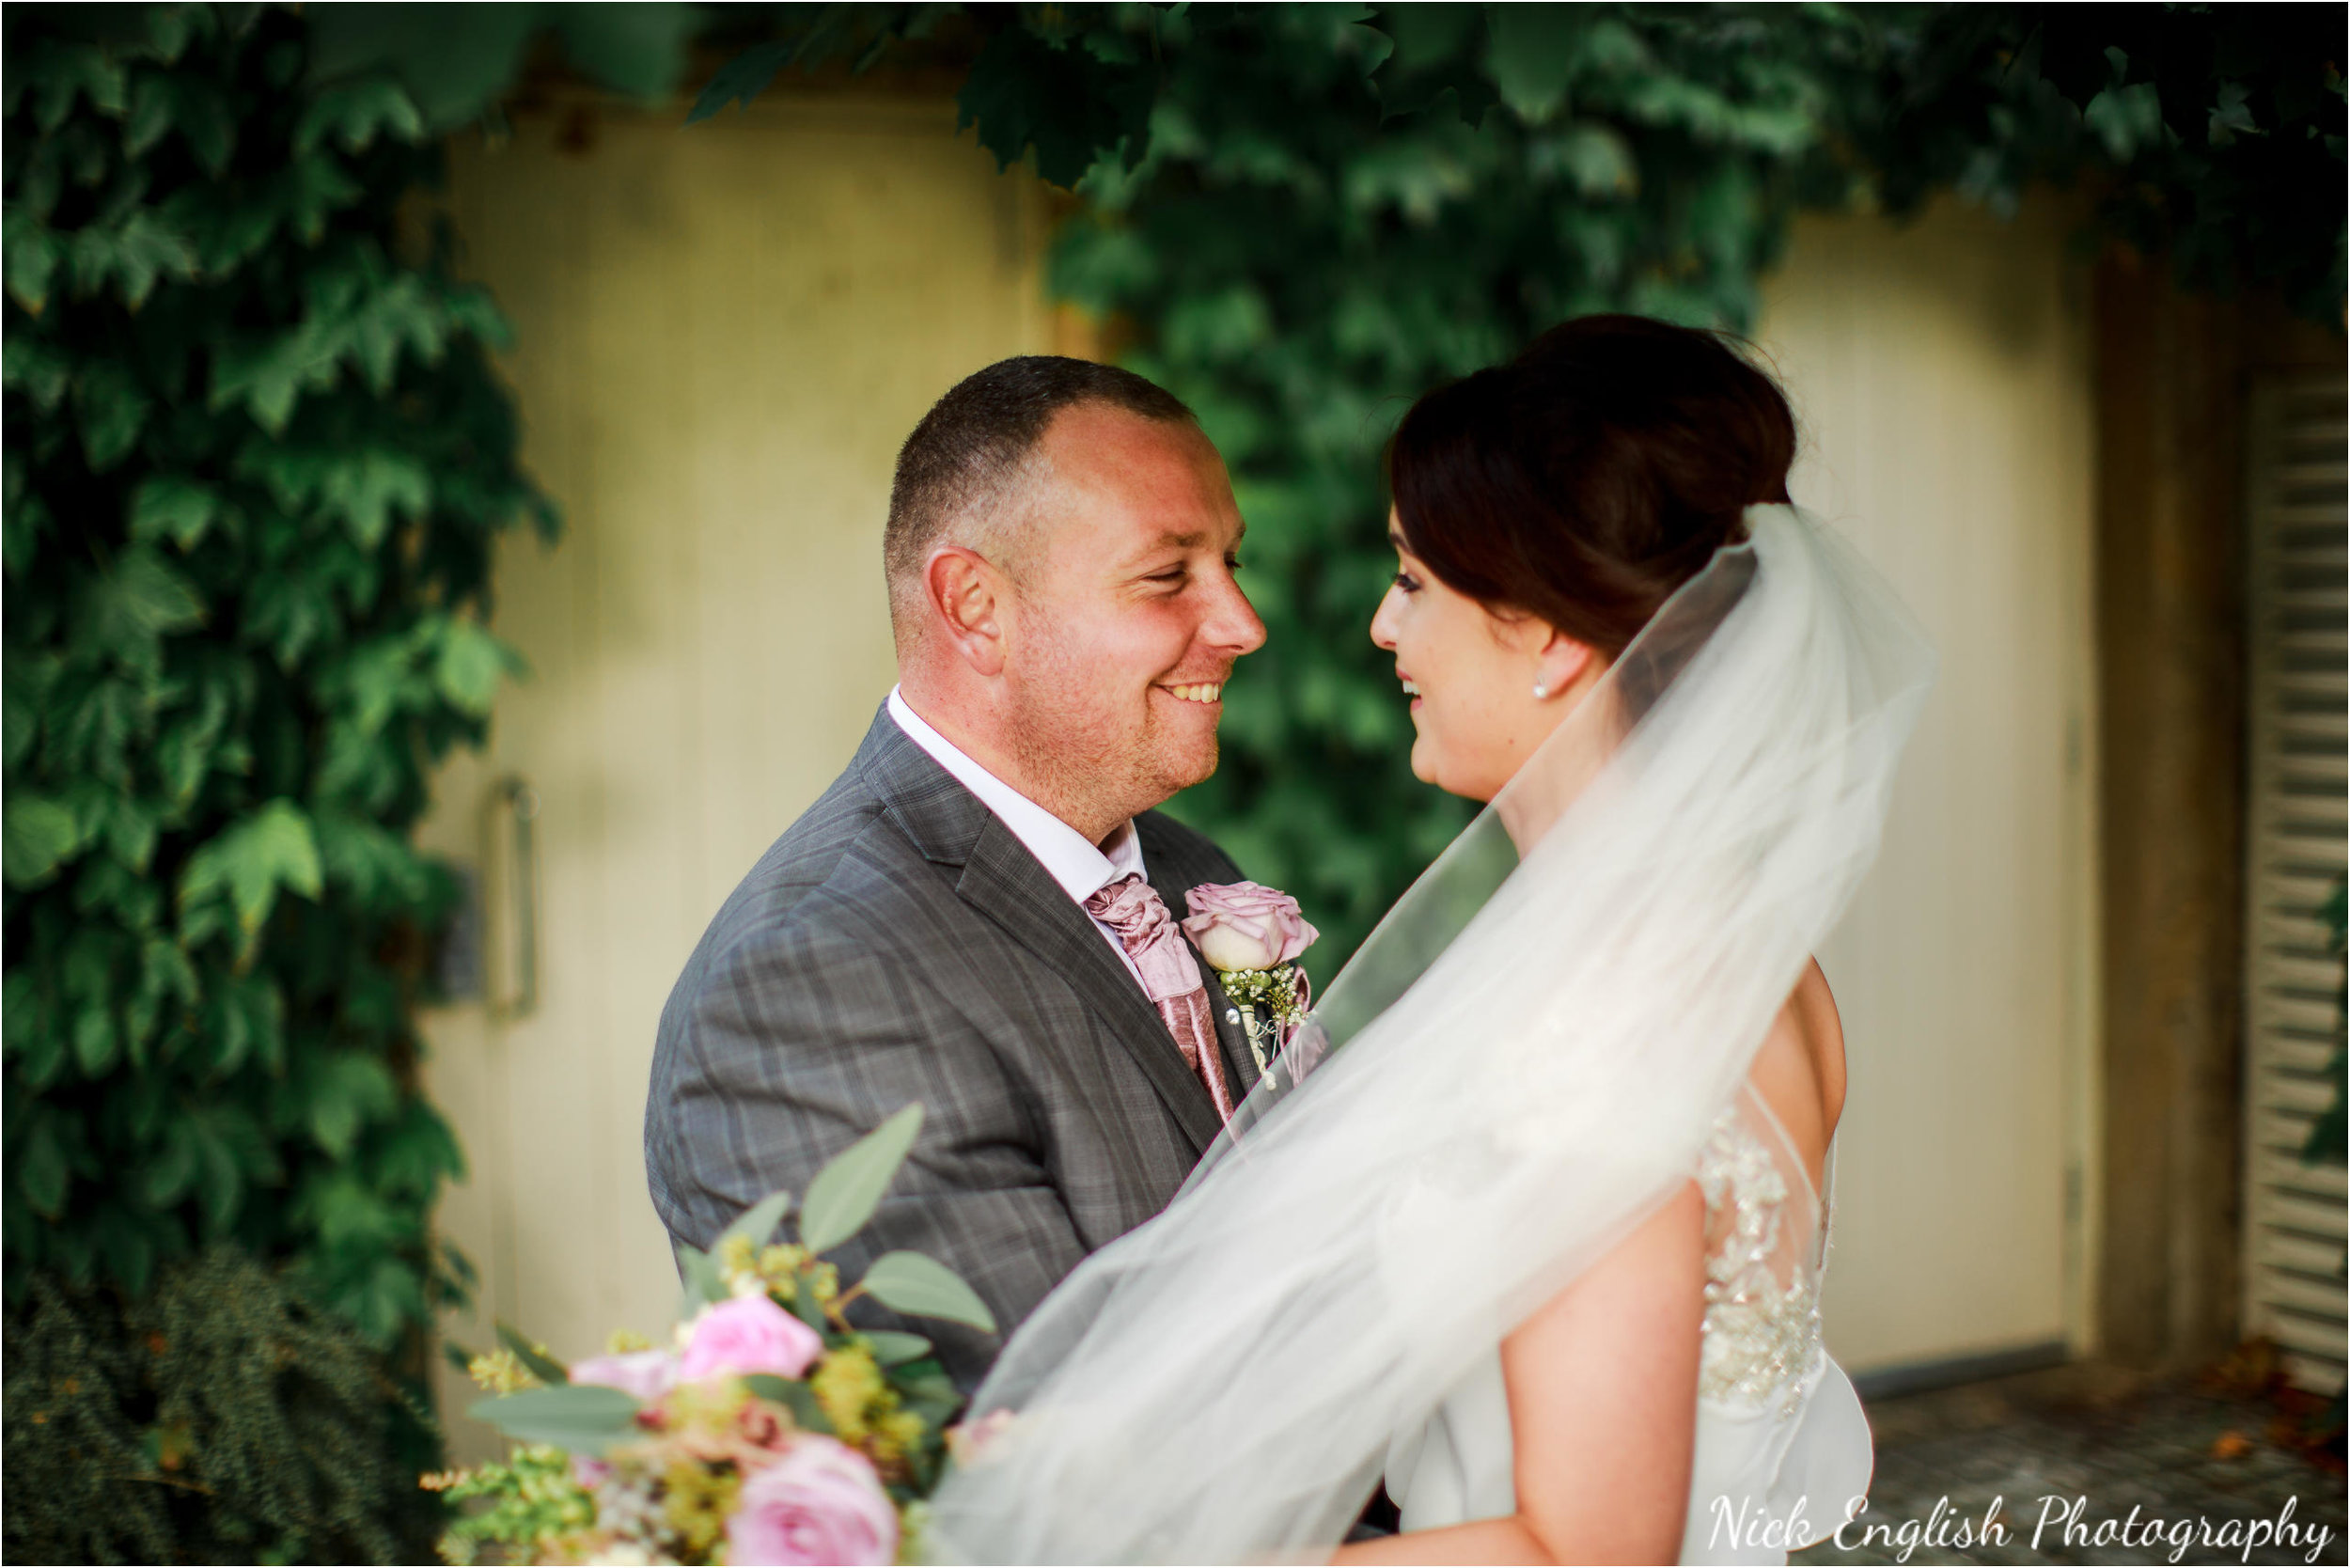 Stacey-Ash-Wedding-Photographs-Stanley-House-Preston-Lancashire-123.jpg